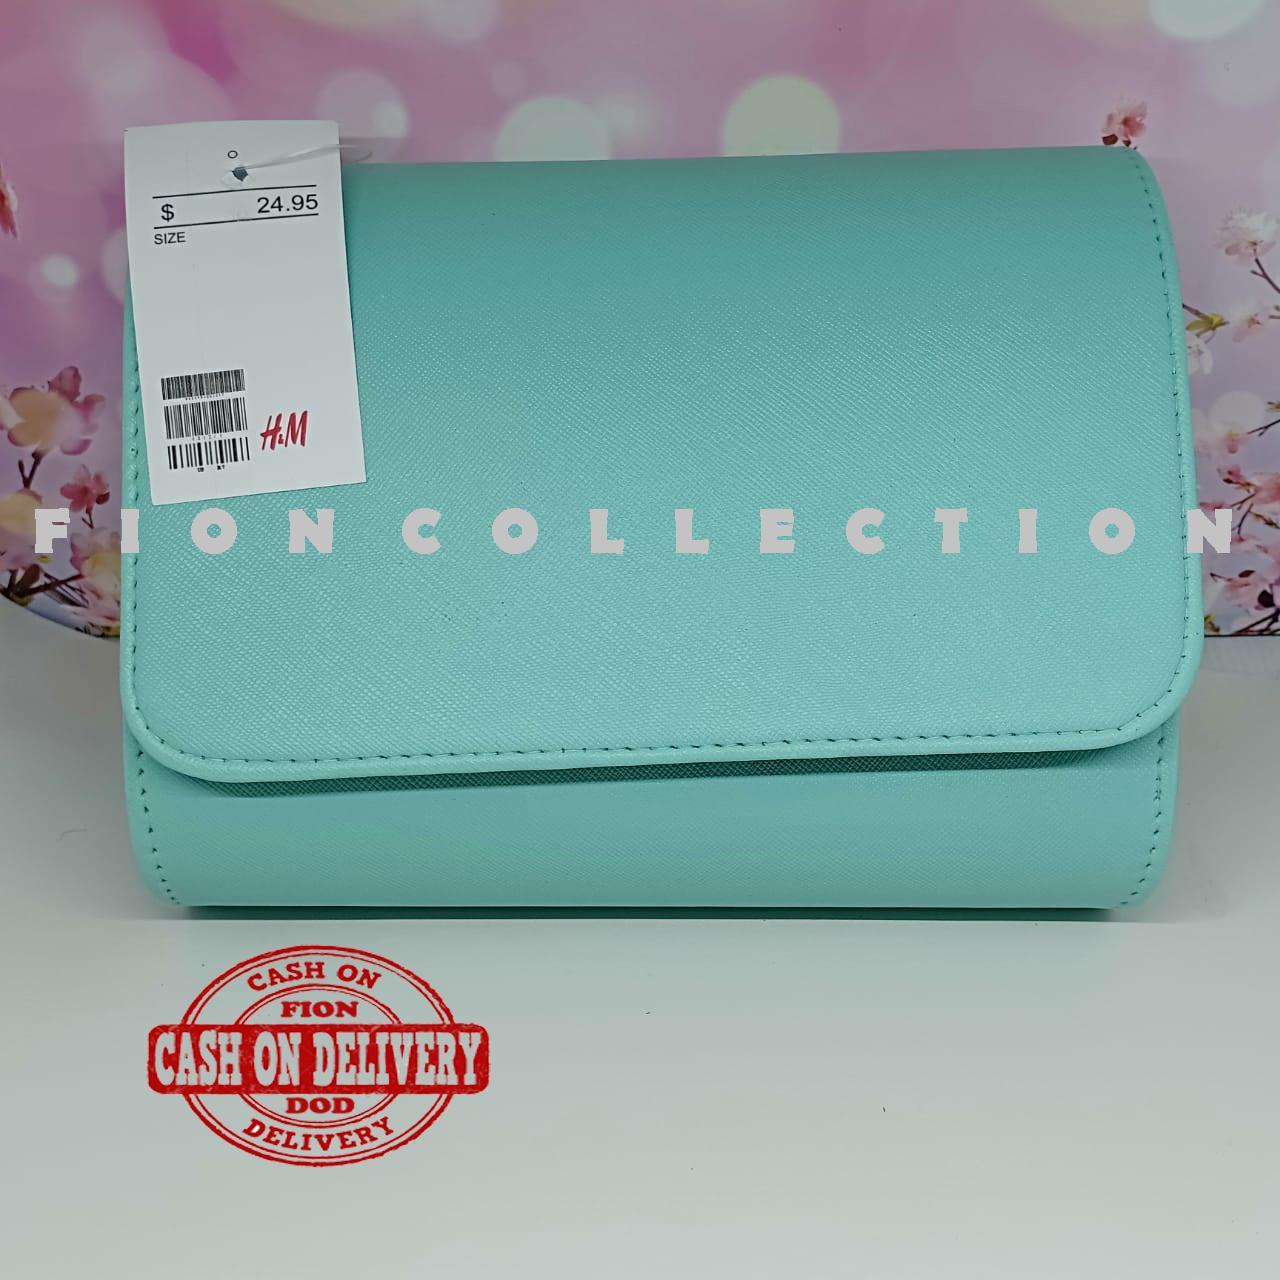 Tas wanita terbaru hnm mini clutch slingbag 19b204ace9